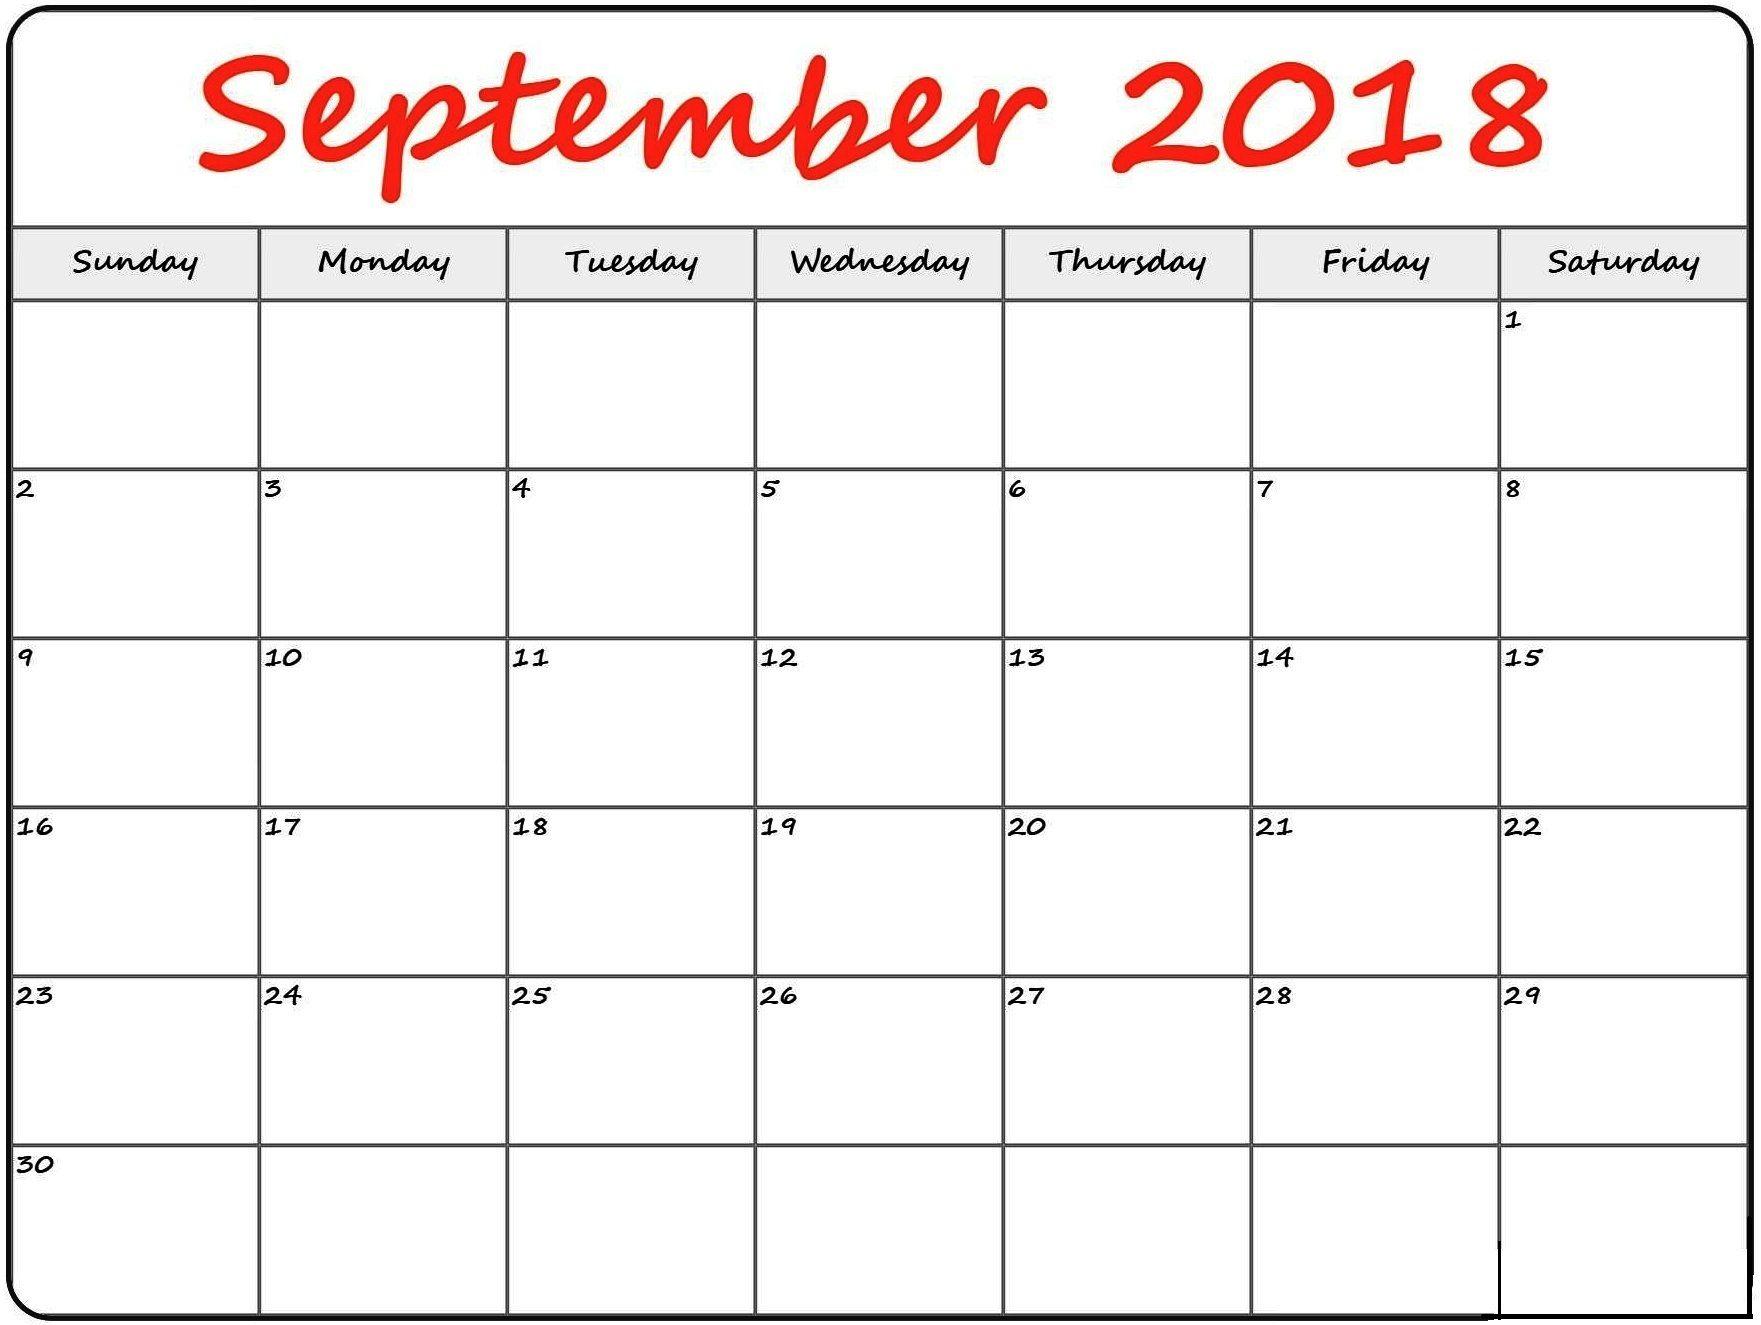 September 2018 Calendar Blank Blank calendar, Calendar